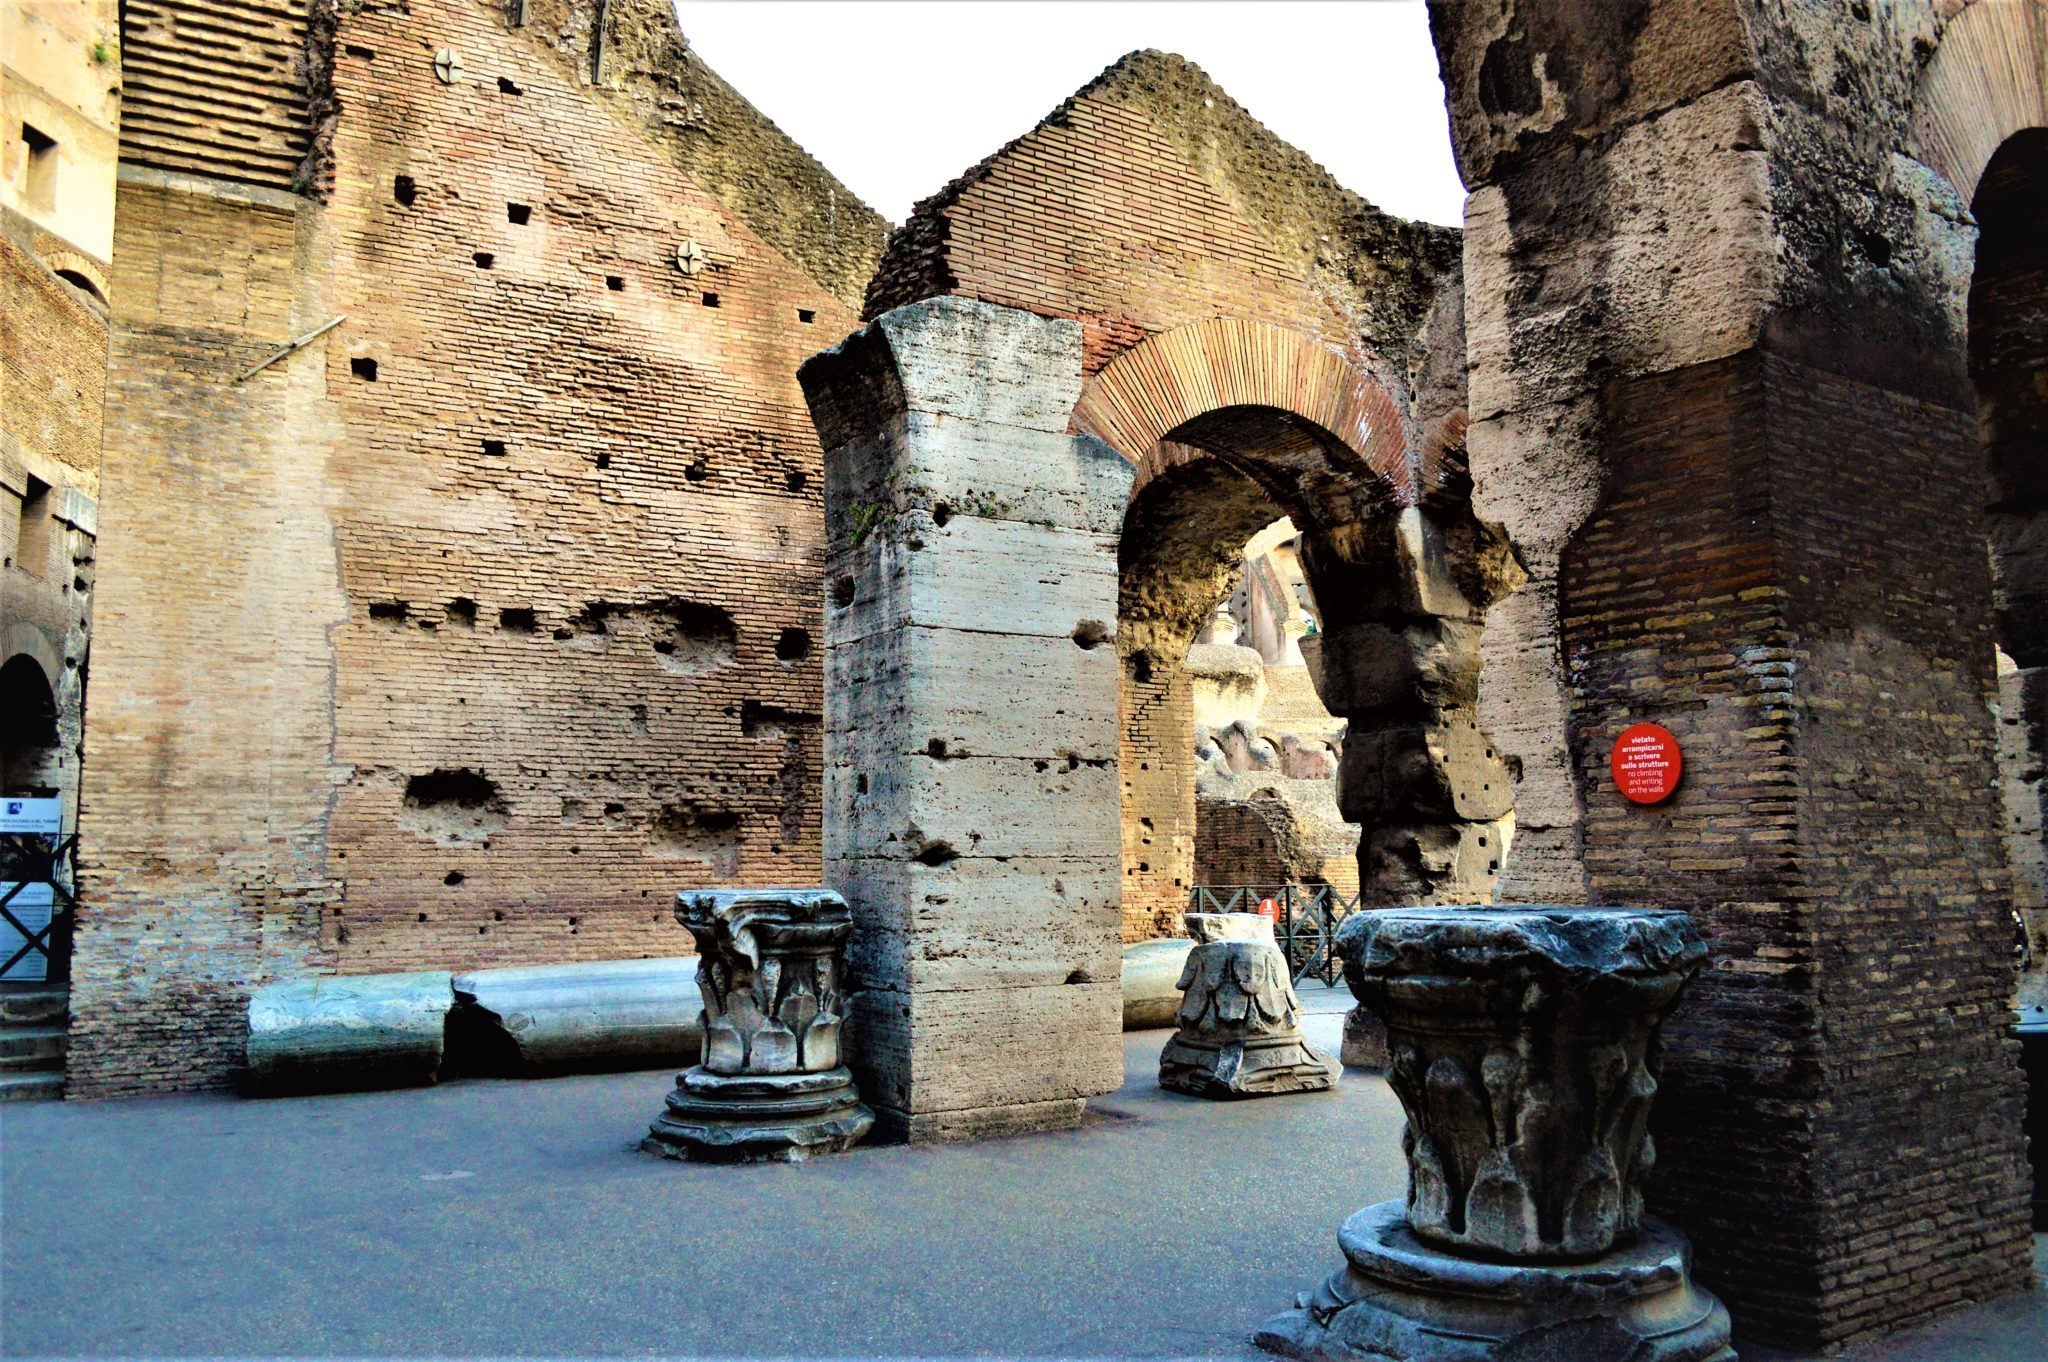 Pillars inside the Roman Colloseum, Rome, Italy